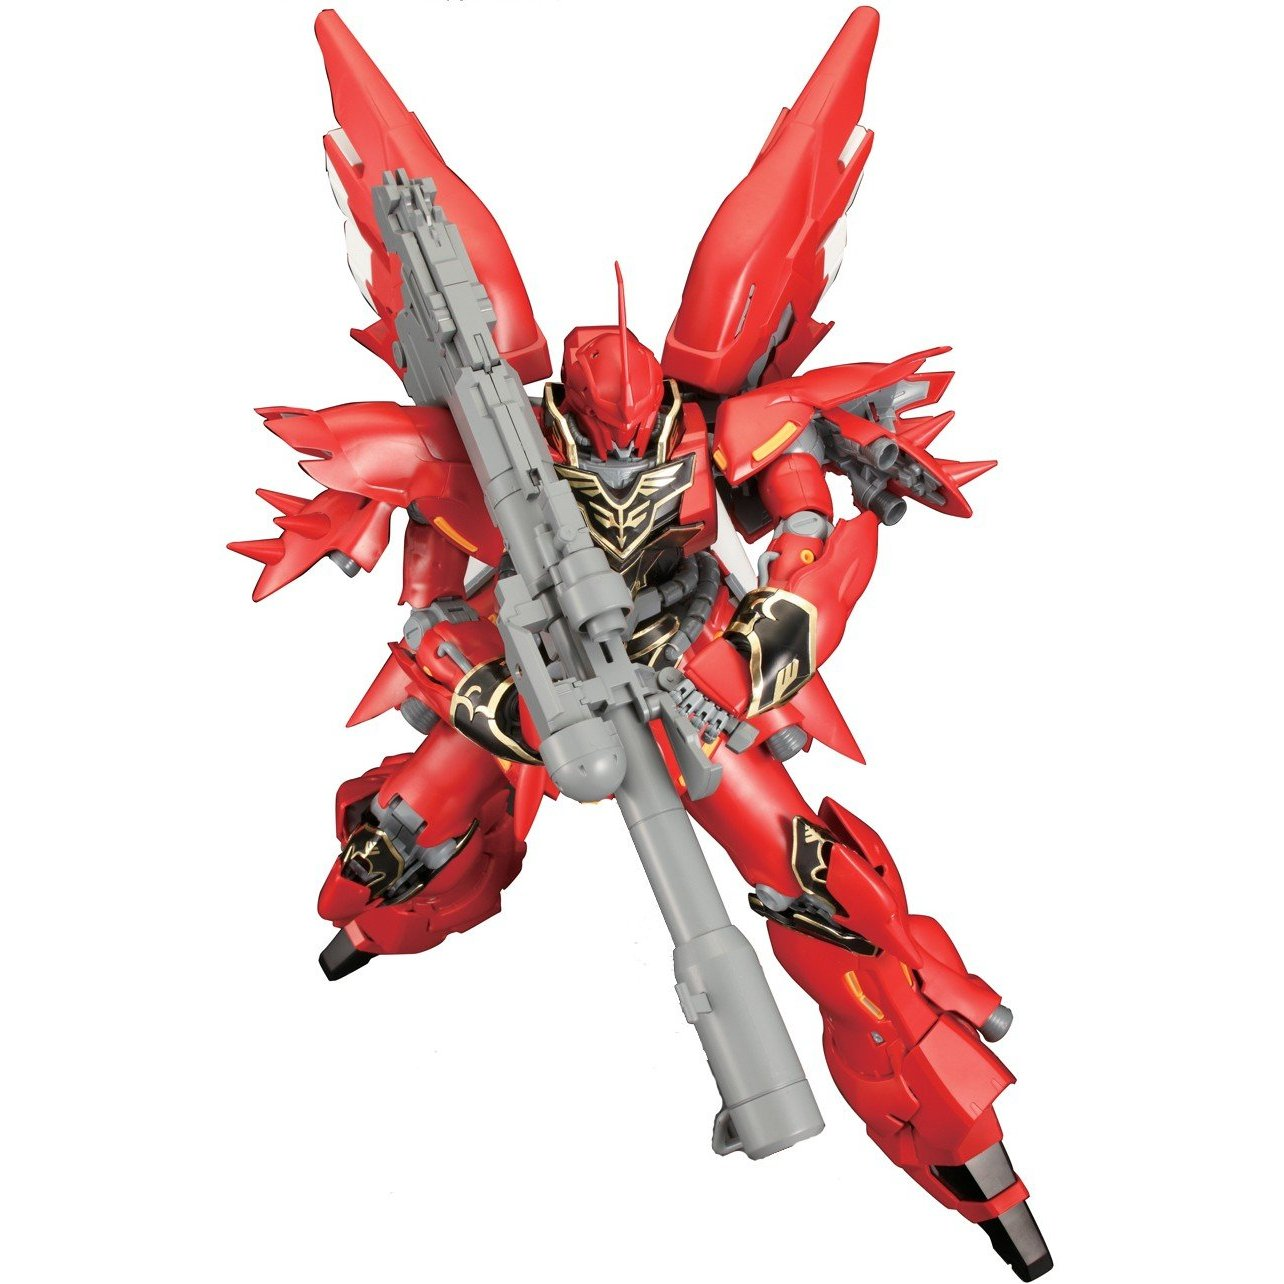 GUNDAM GUY: MG 1/100 Sinanju [OVA Ver.] - New Images ...